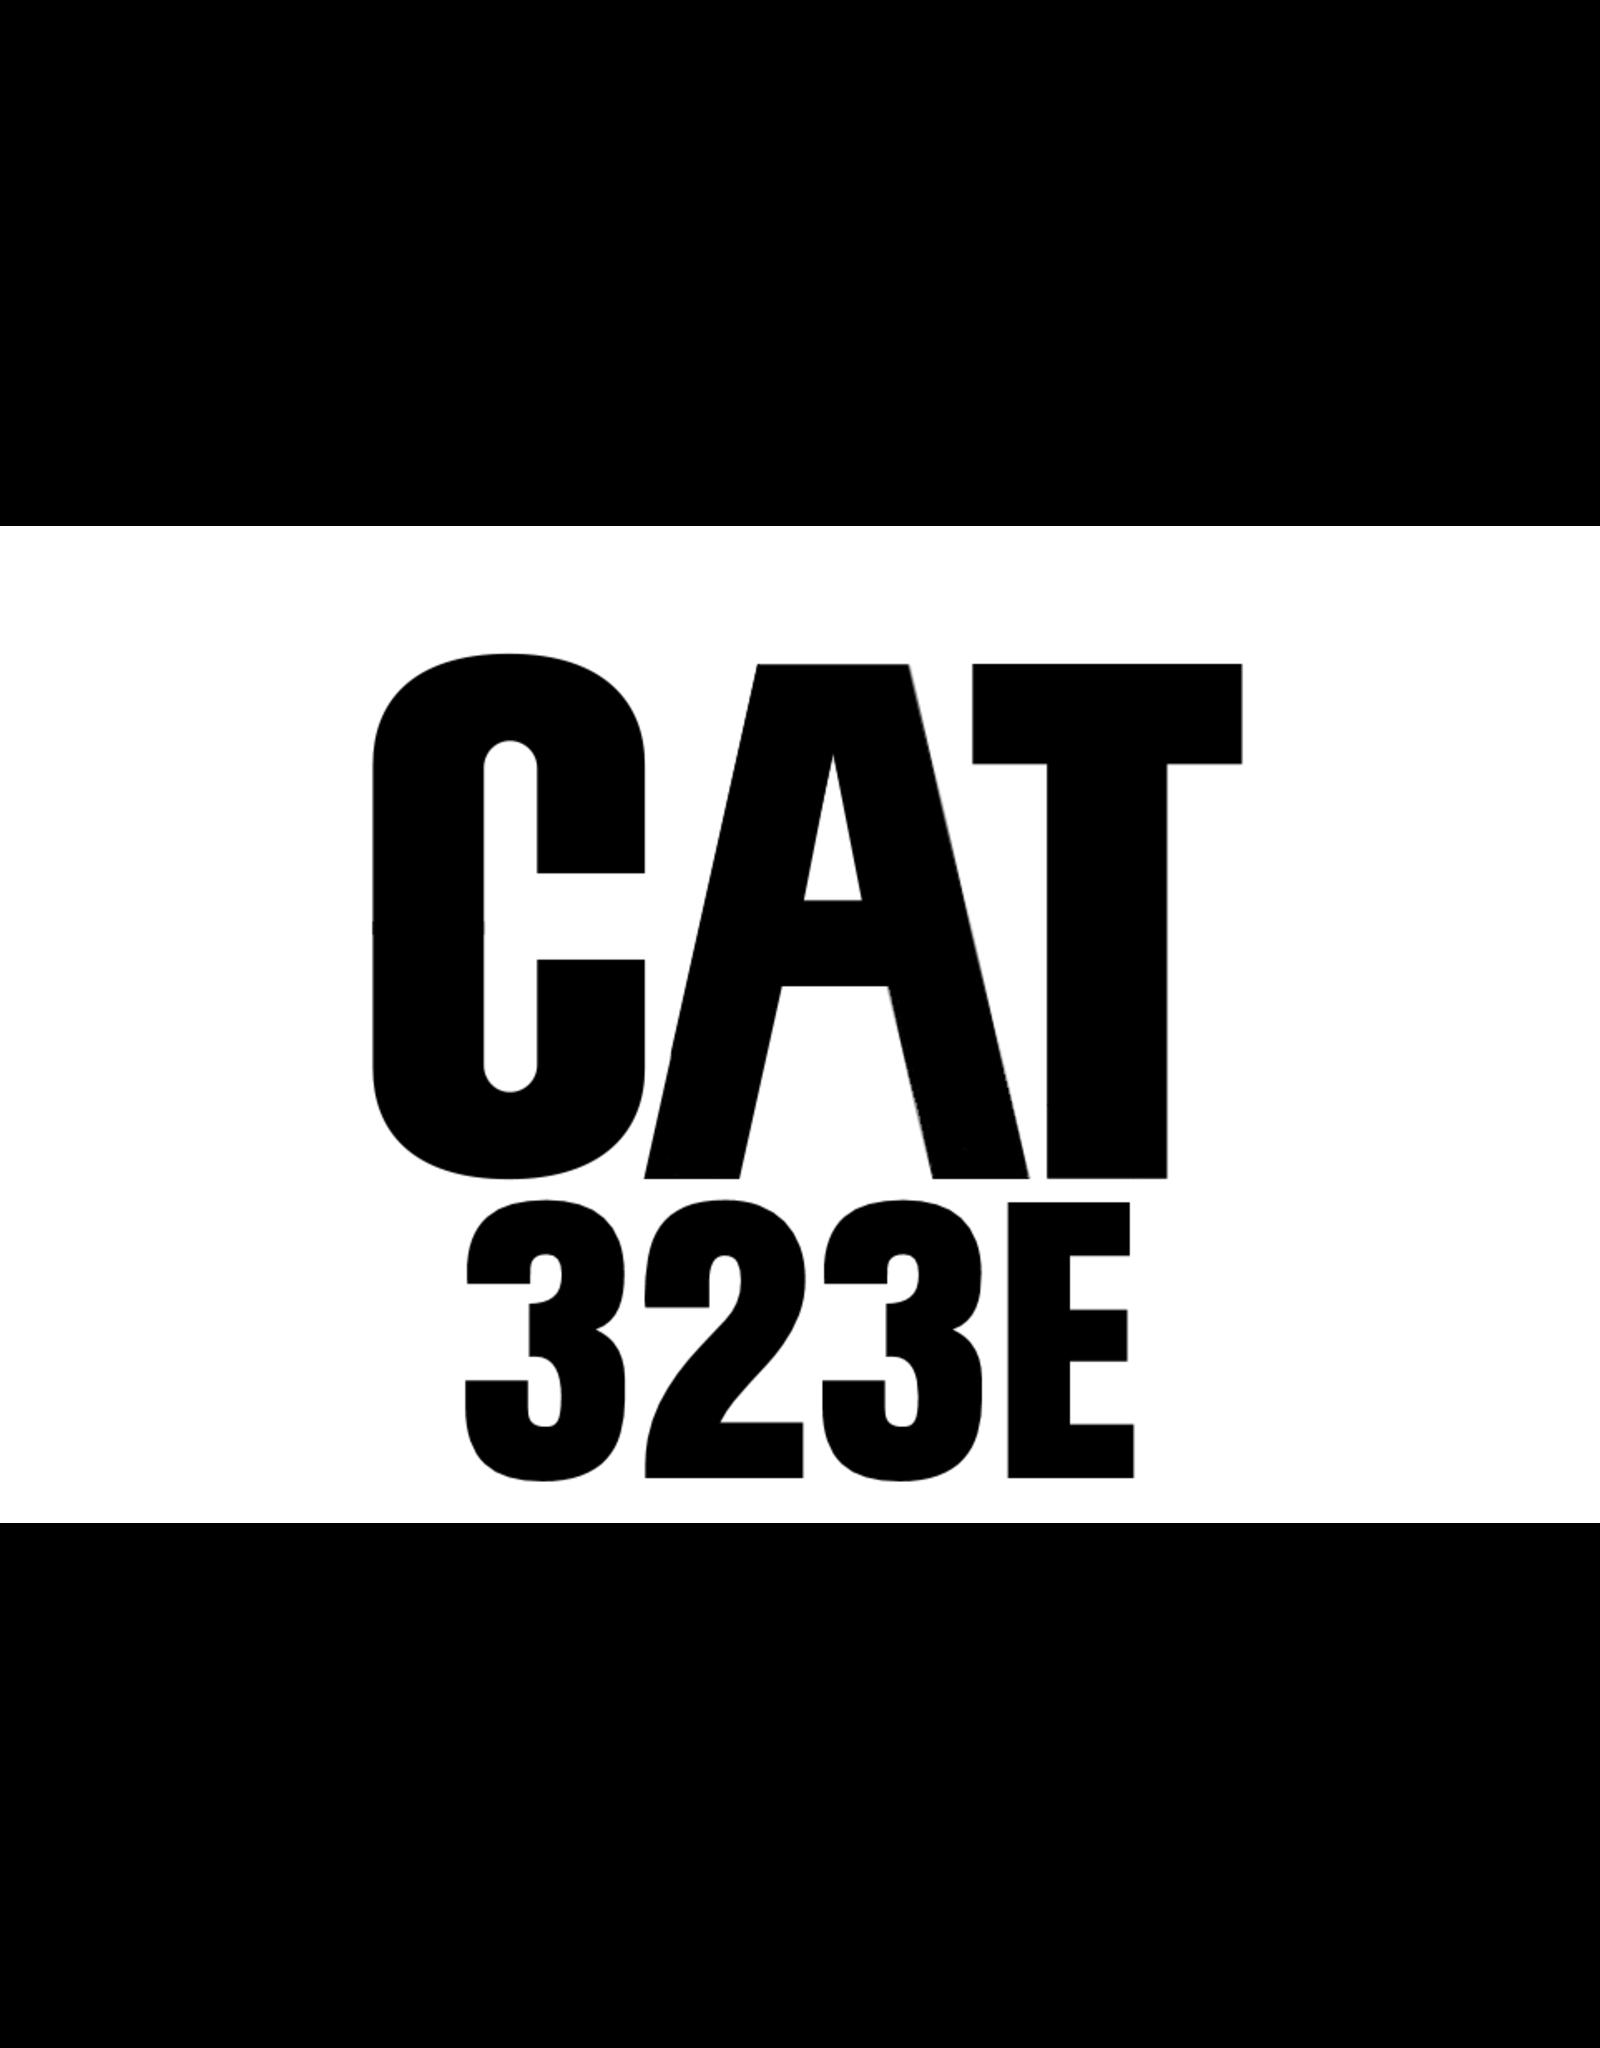 Echle Hartstahl GmbH FOPS für CAT 323E